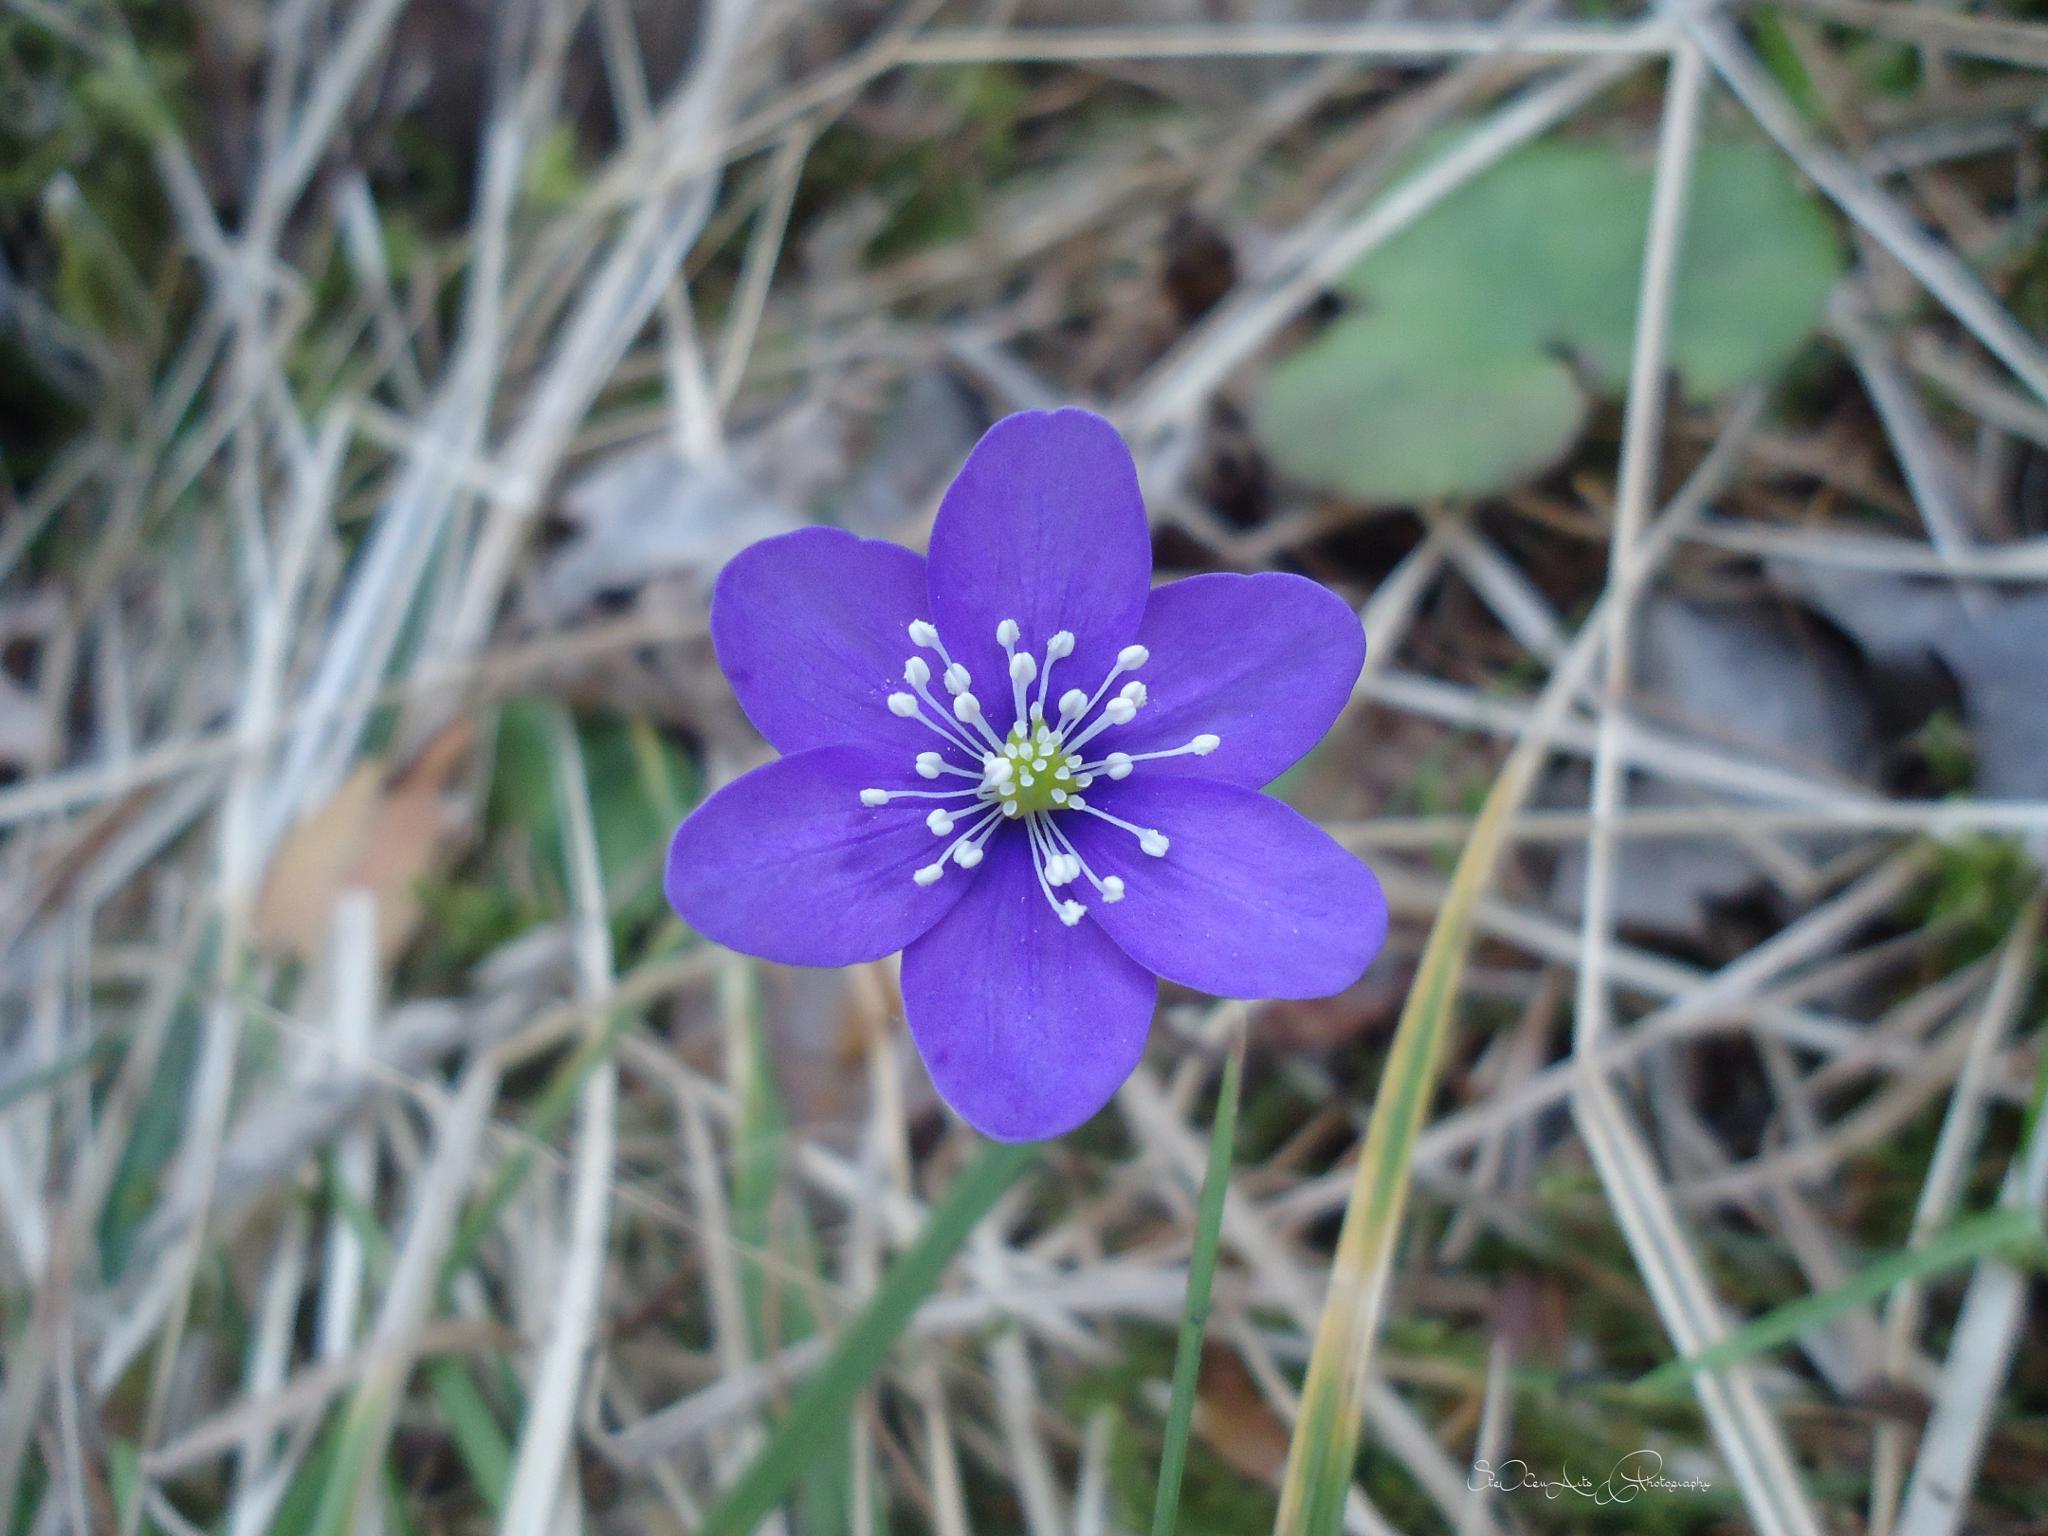 blue anemone by Sanna